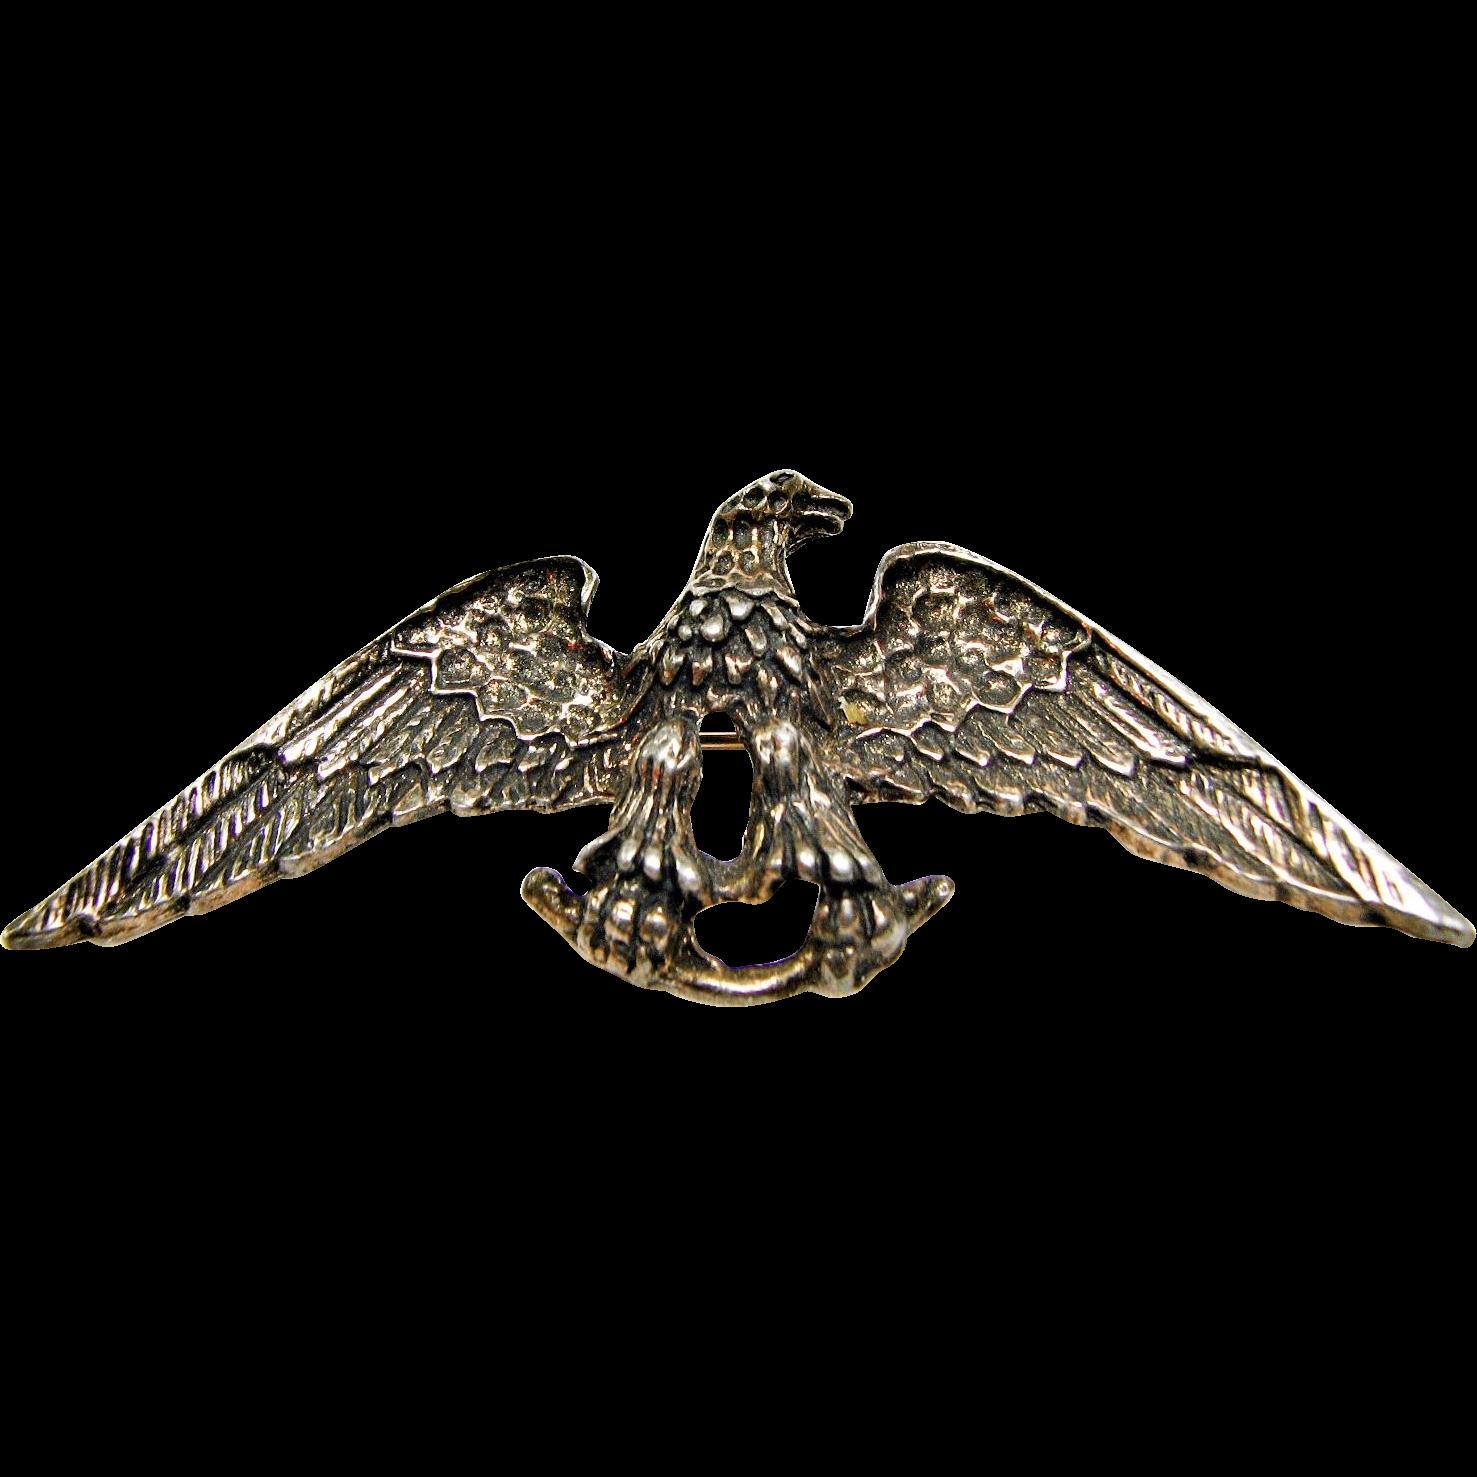 pin 1440x900 american eagle - photo #22